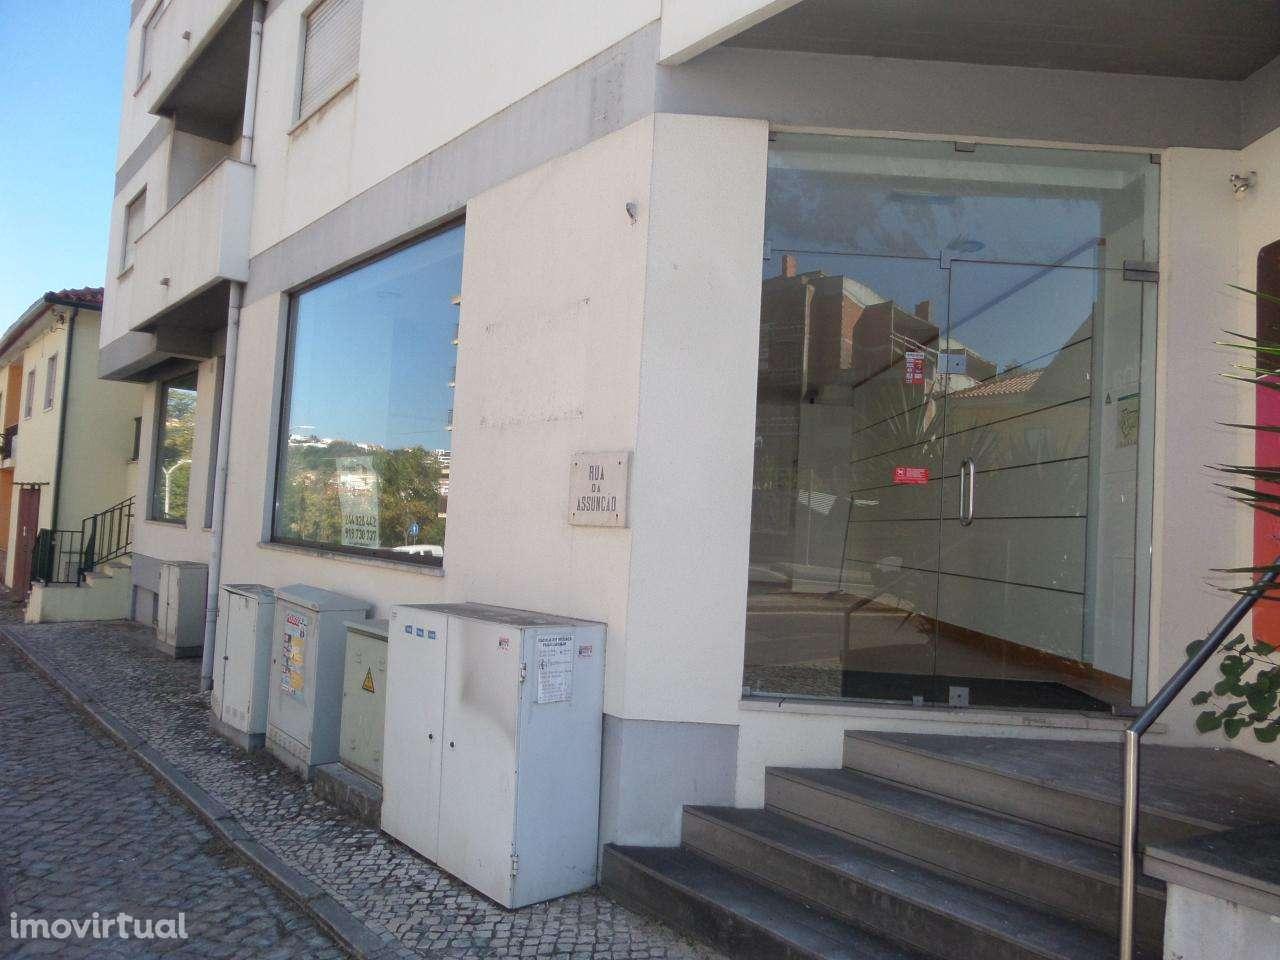 Loja para arrendar, Leiria, Pousos, Barreira e Cortes, Leiria - Foto 10